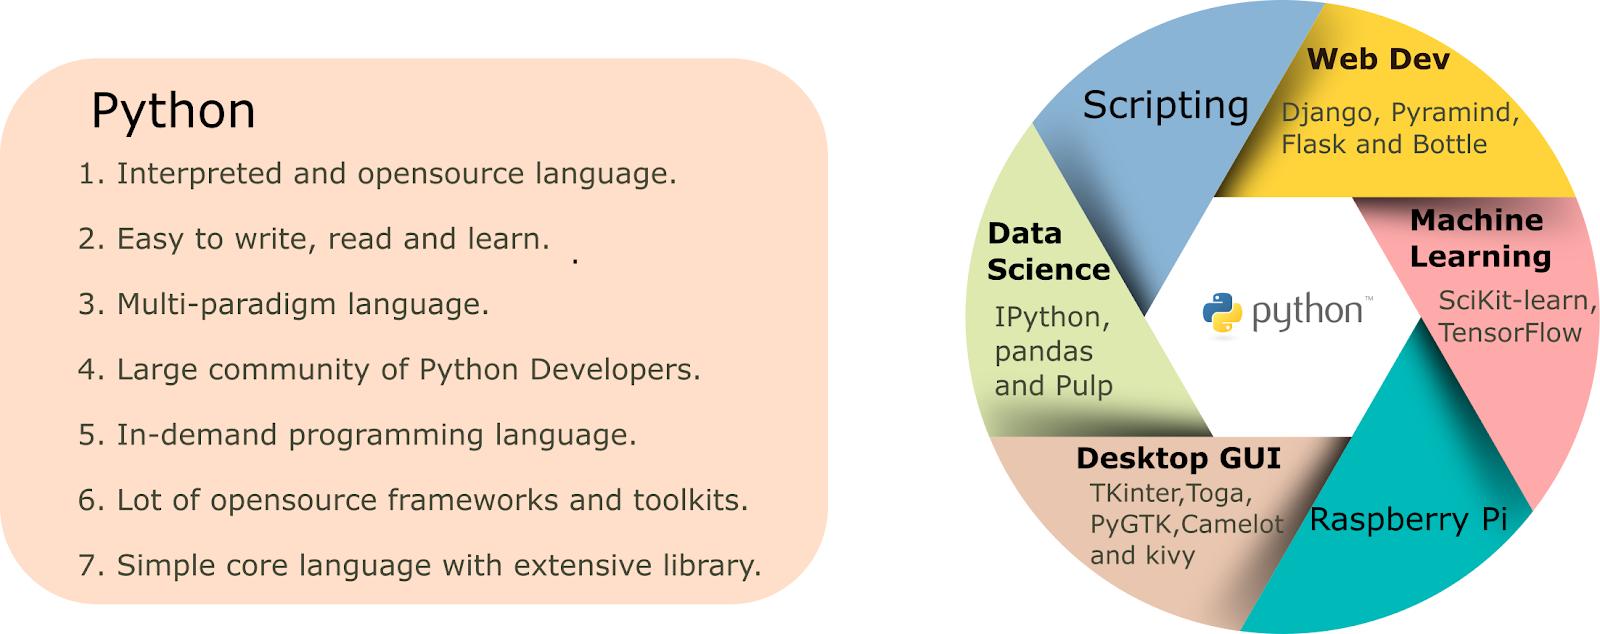 Introduction to Python Programming Language - Turbo Python